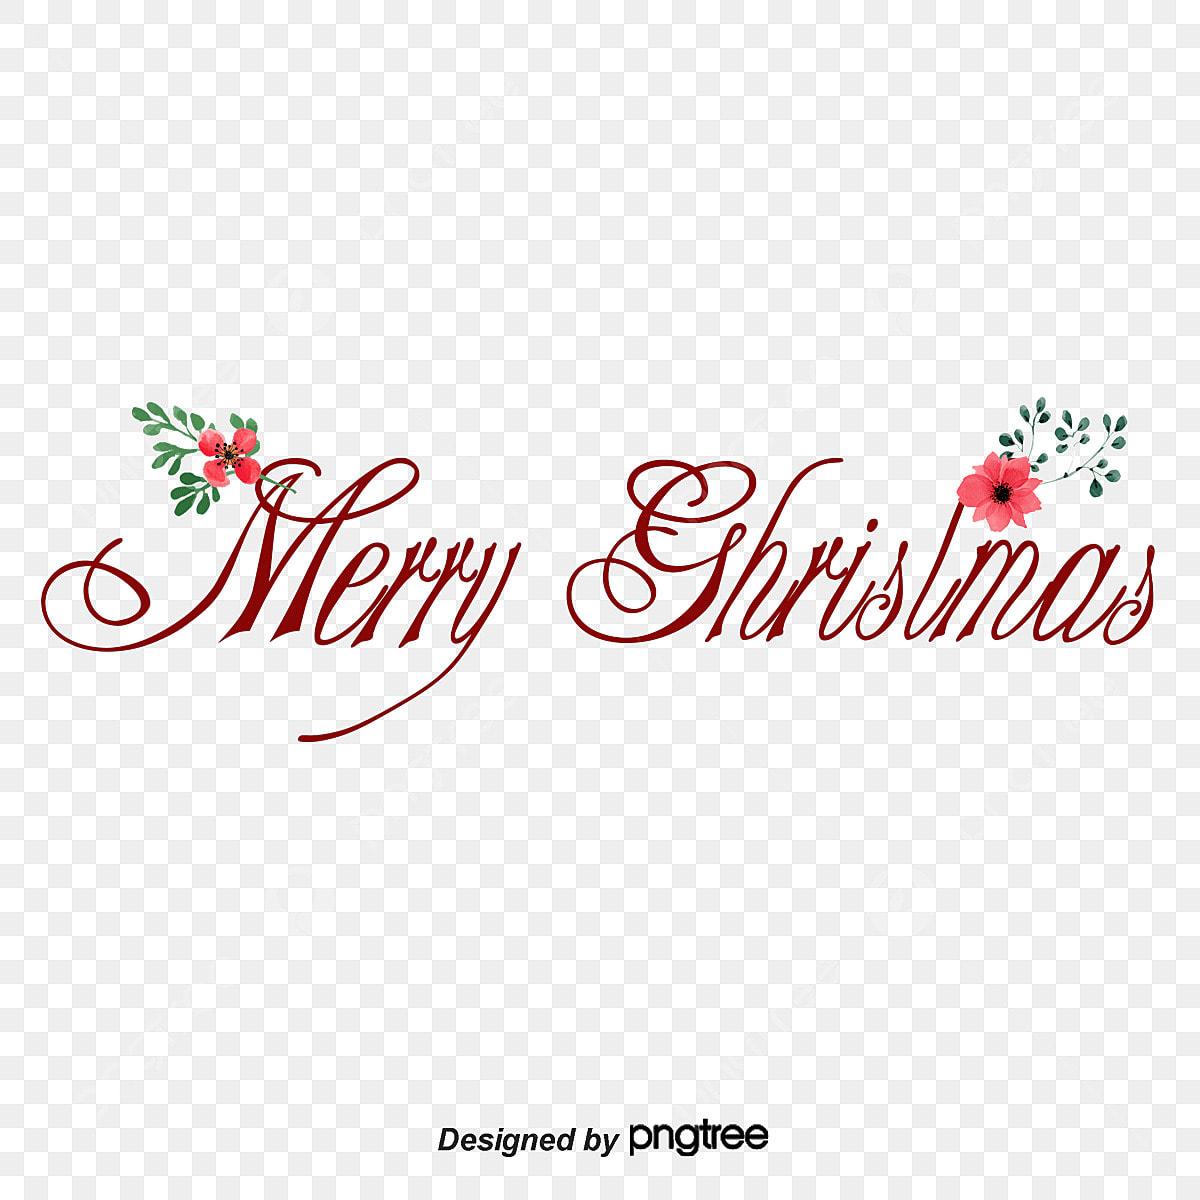 Merry Christmas Word Art Png.Merry Christmas English Words Merry Christmas Wordart